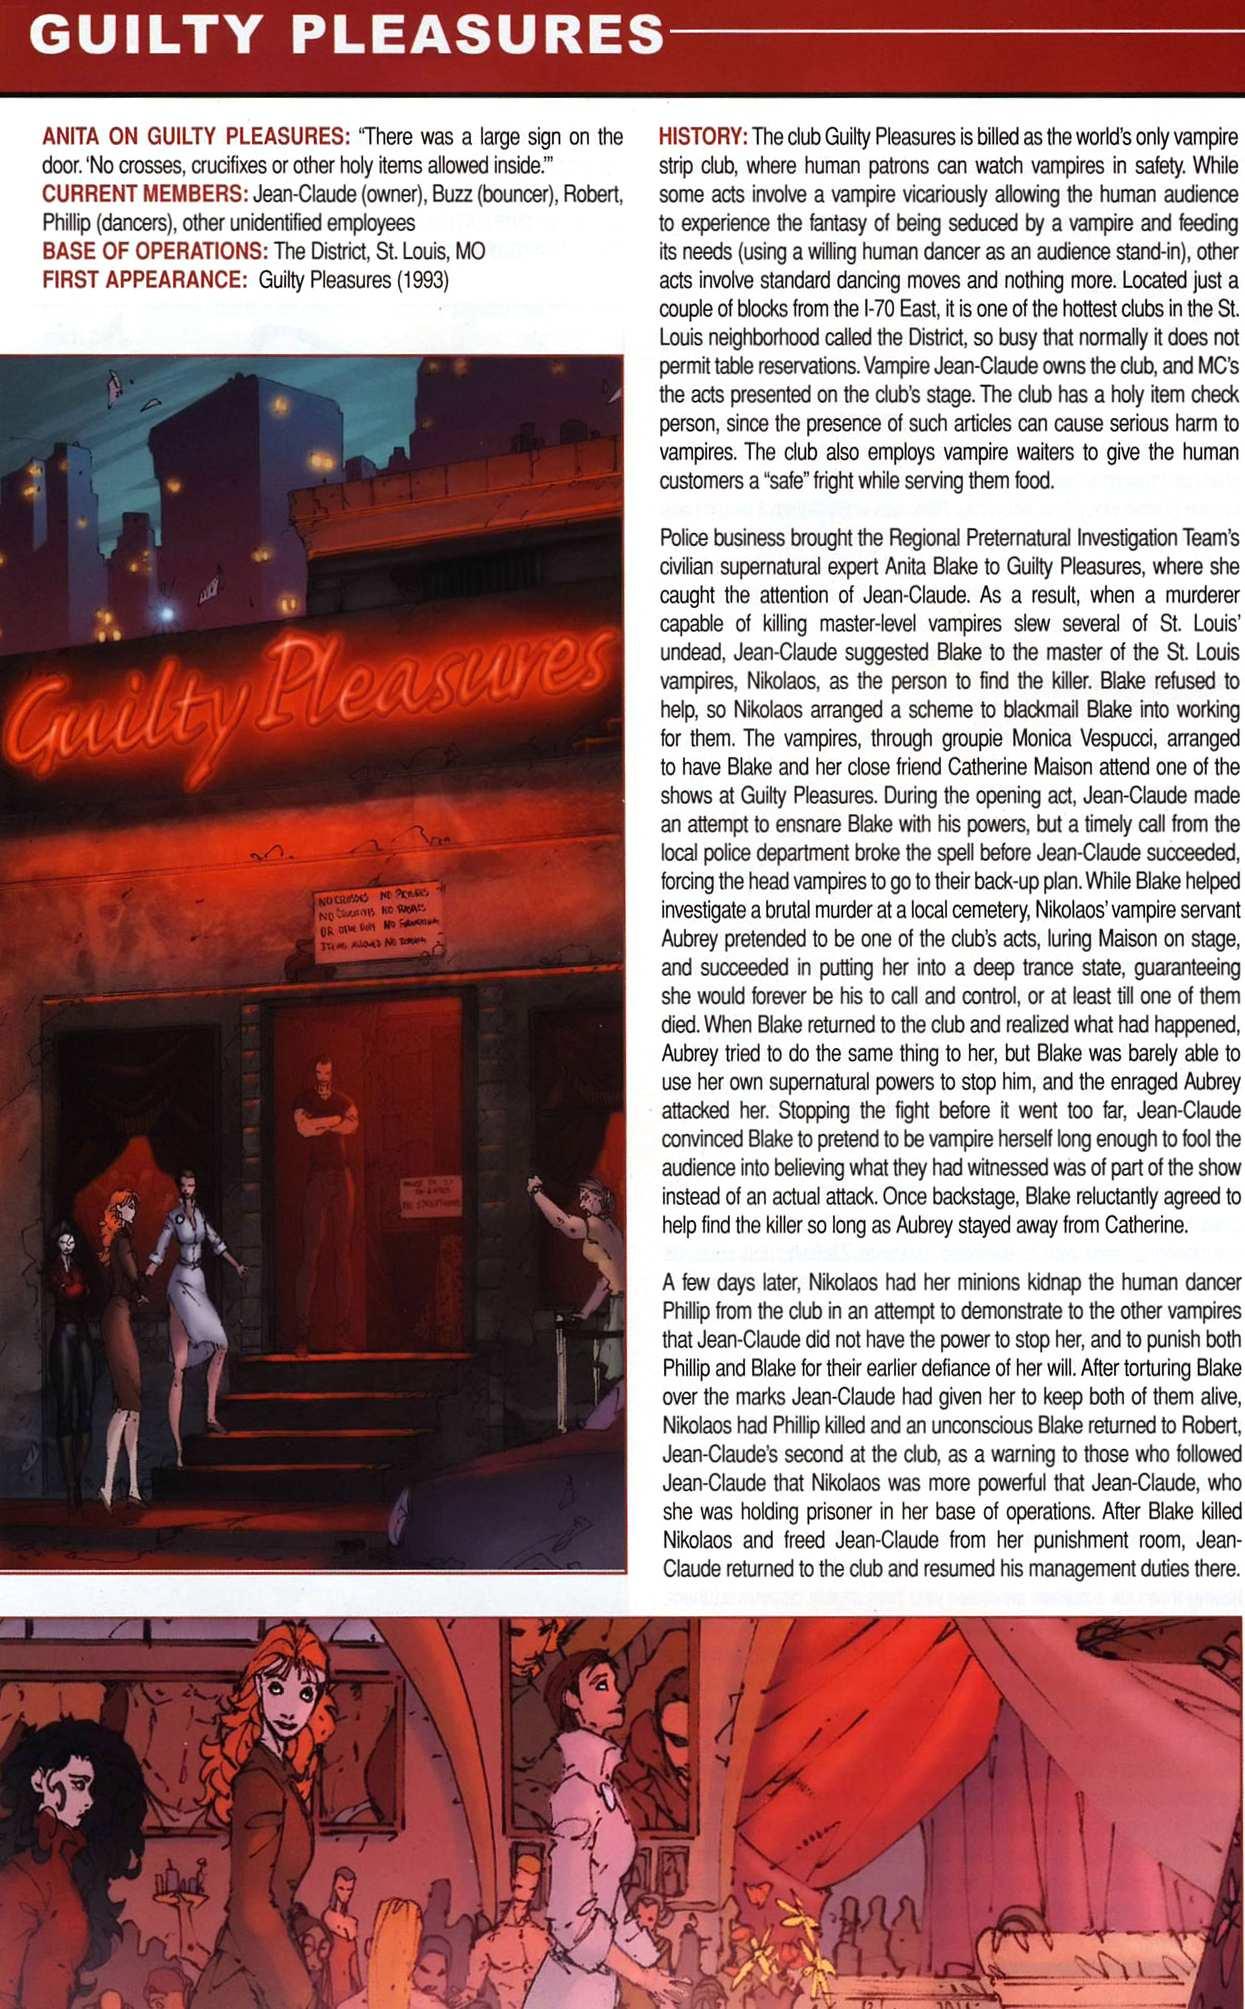 Read online Anita Blake, Vampire Hunter: Guilty Pleasures Handbook comic -  Issue #Anita Blake, Vampire Hunter: Guilty Pleasures Handbook Full - 18